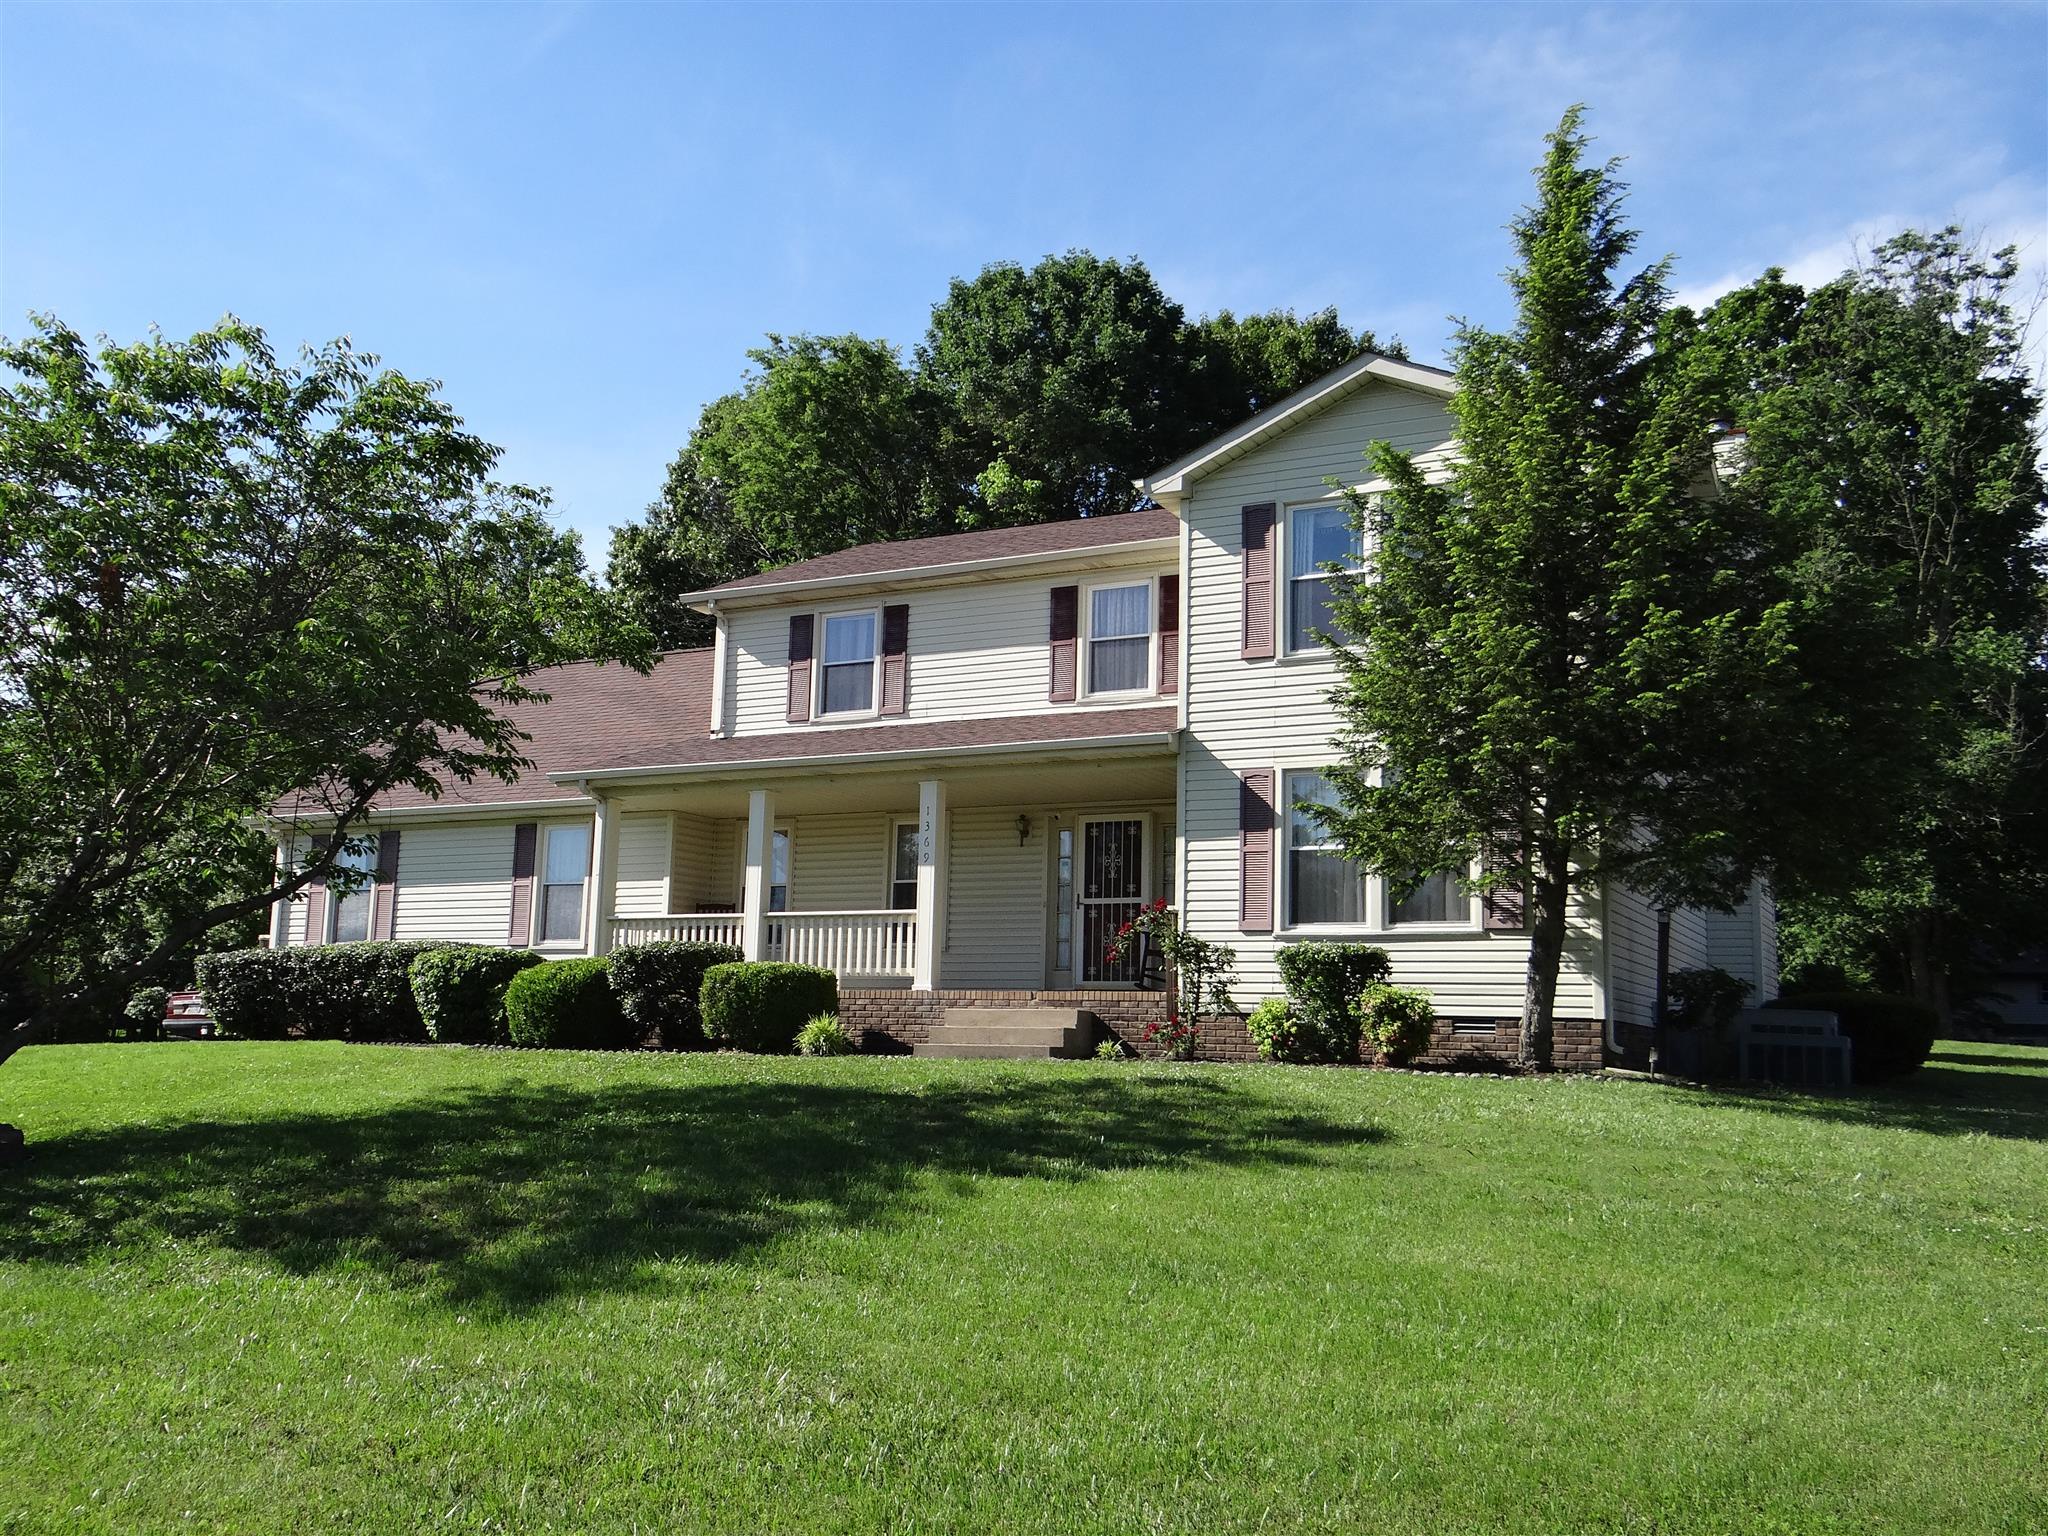 1369 W Rhett Butler Rd, N, Clarksville, TN 37042 - Clarksville, TN real estate listing